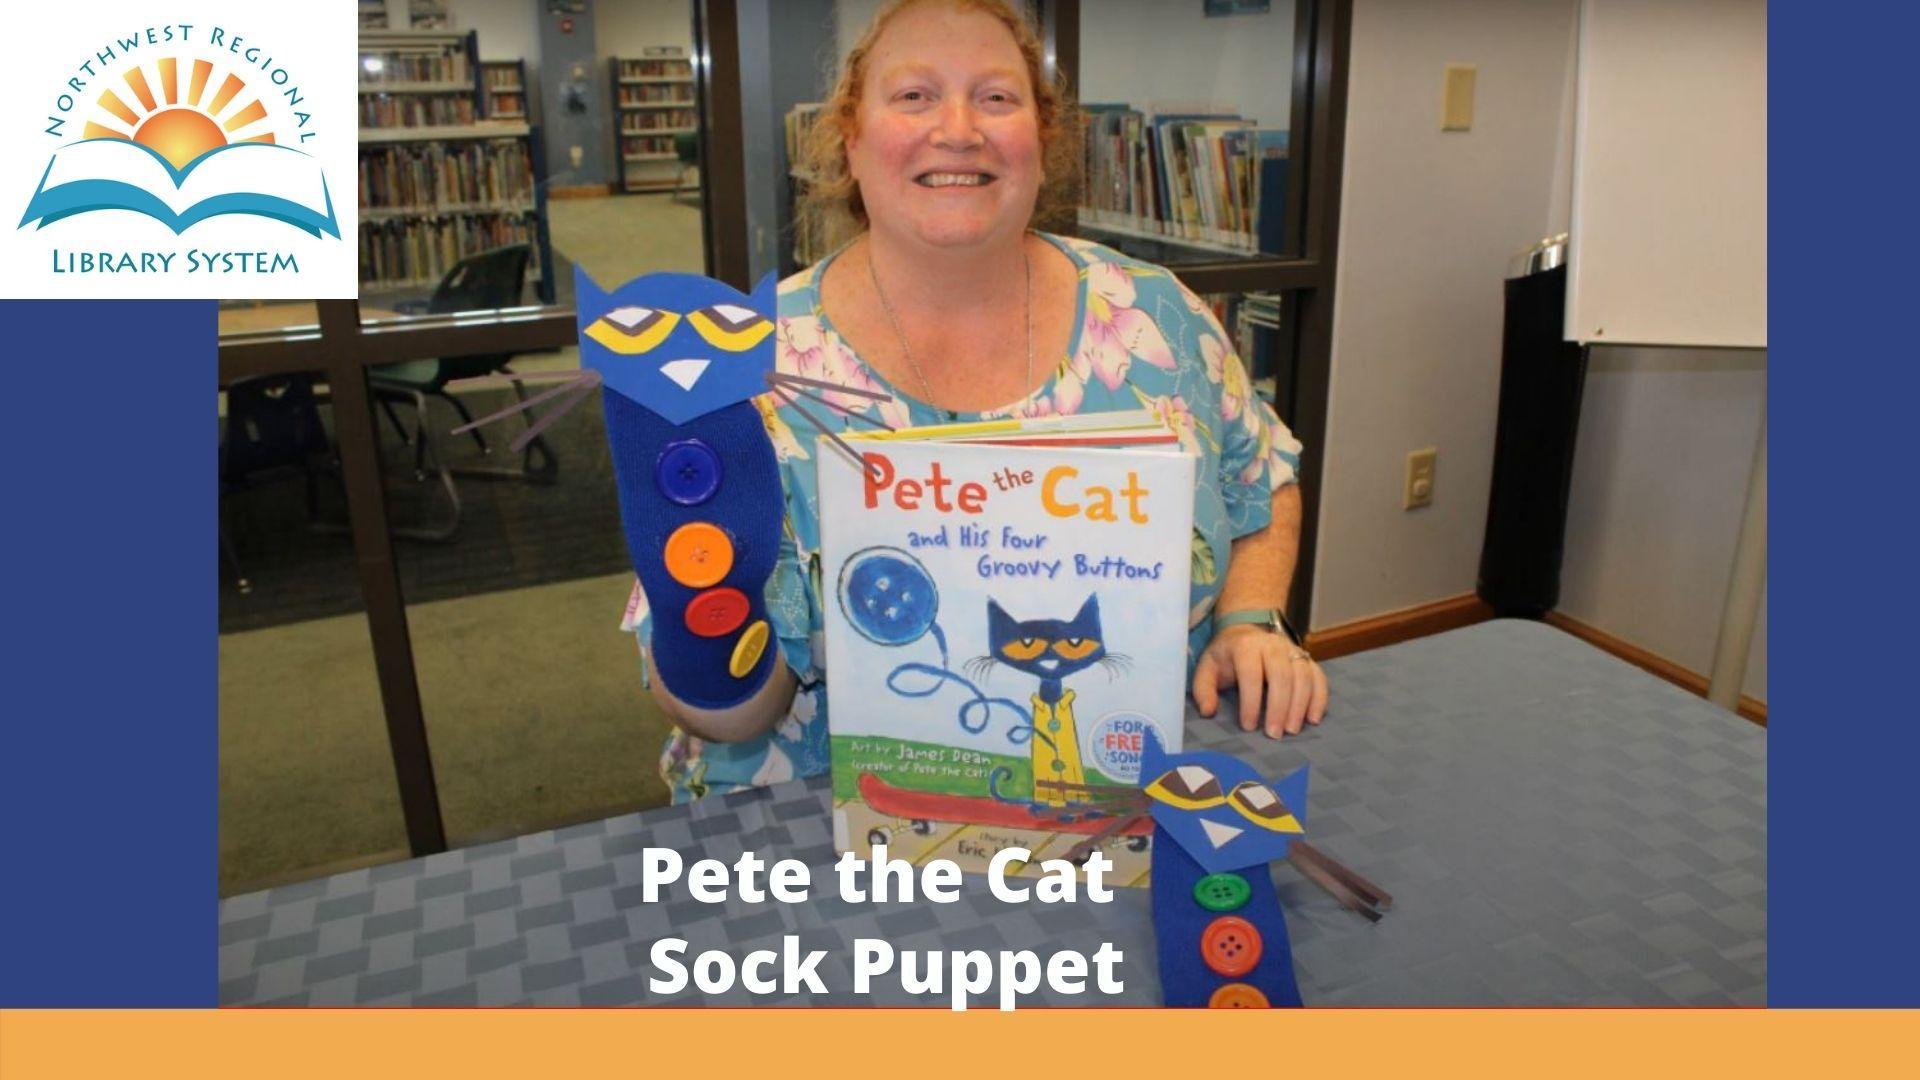 Pete the Cat Sock Puppet